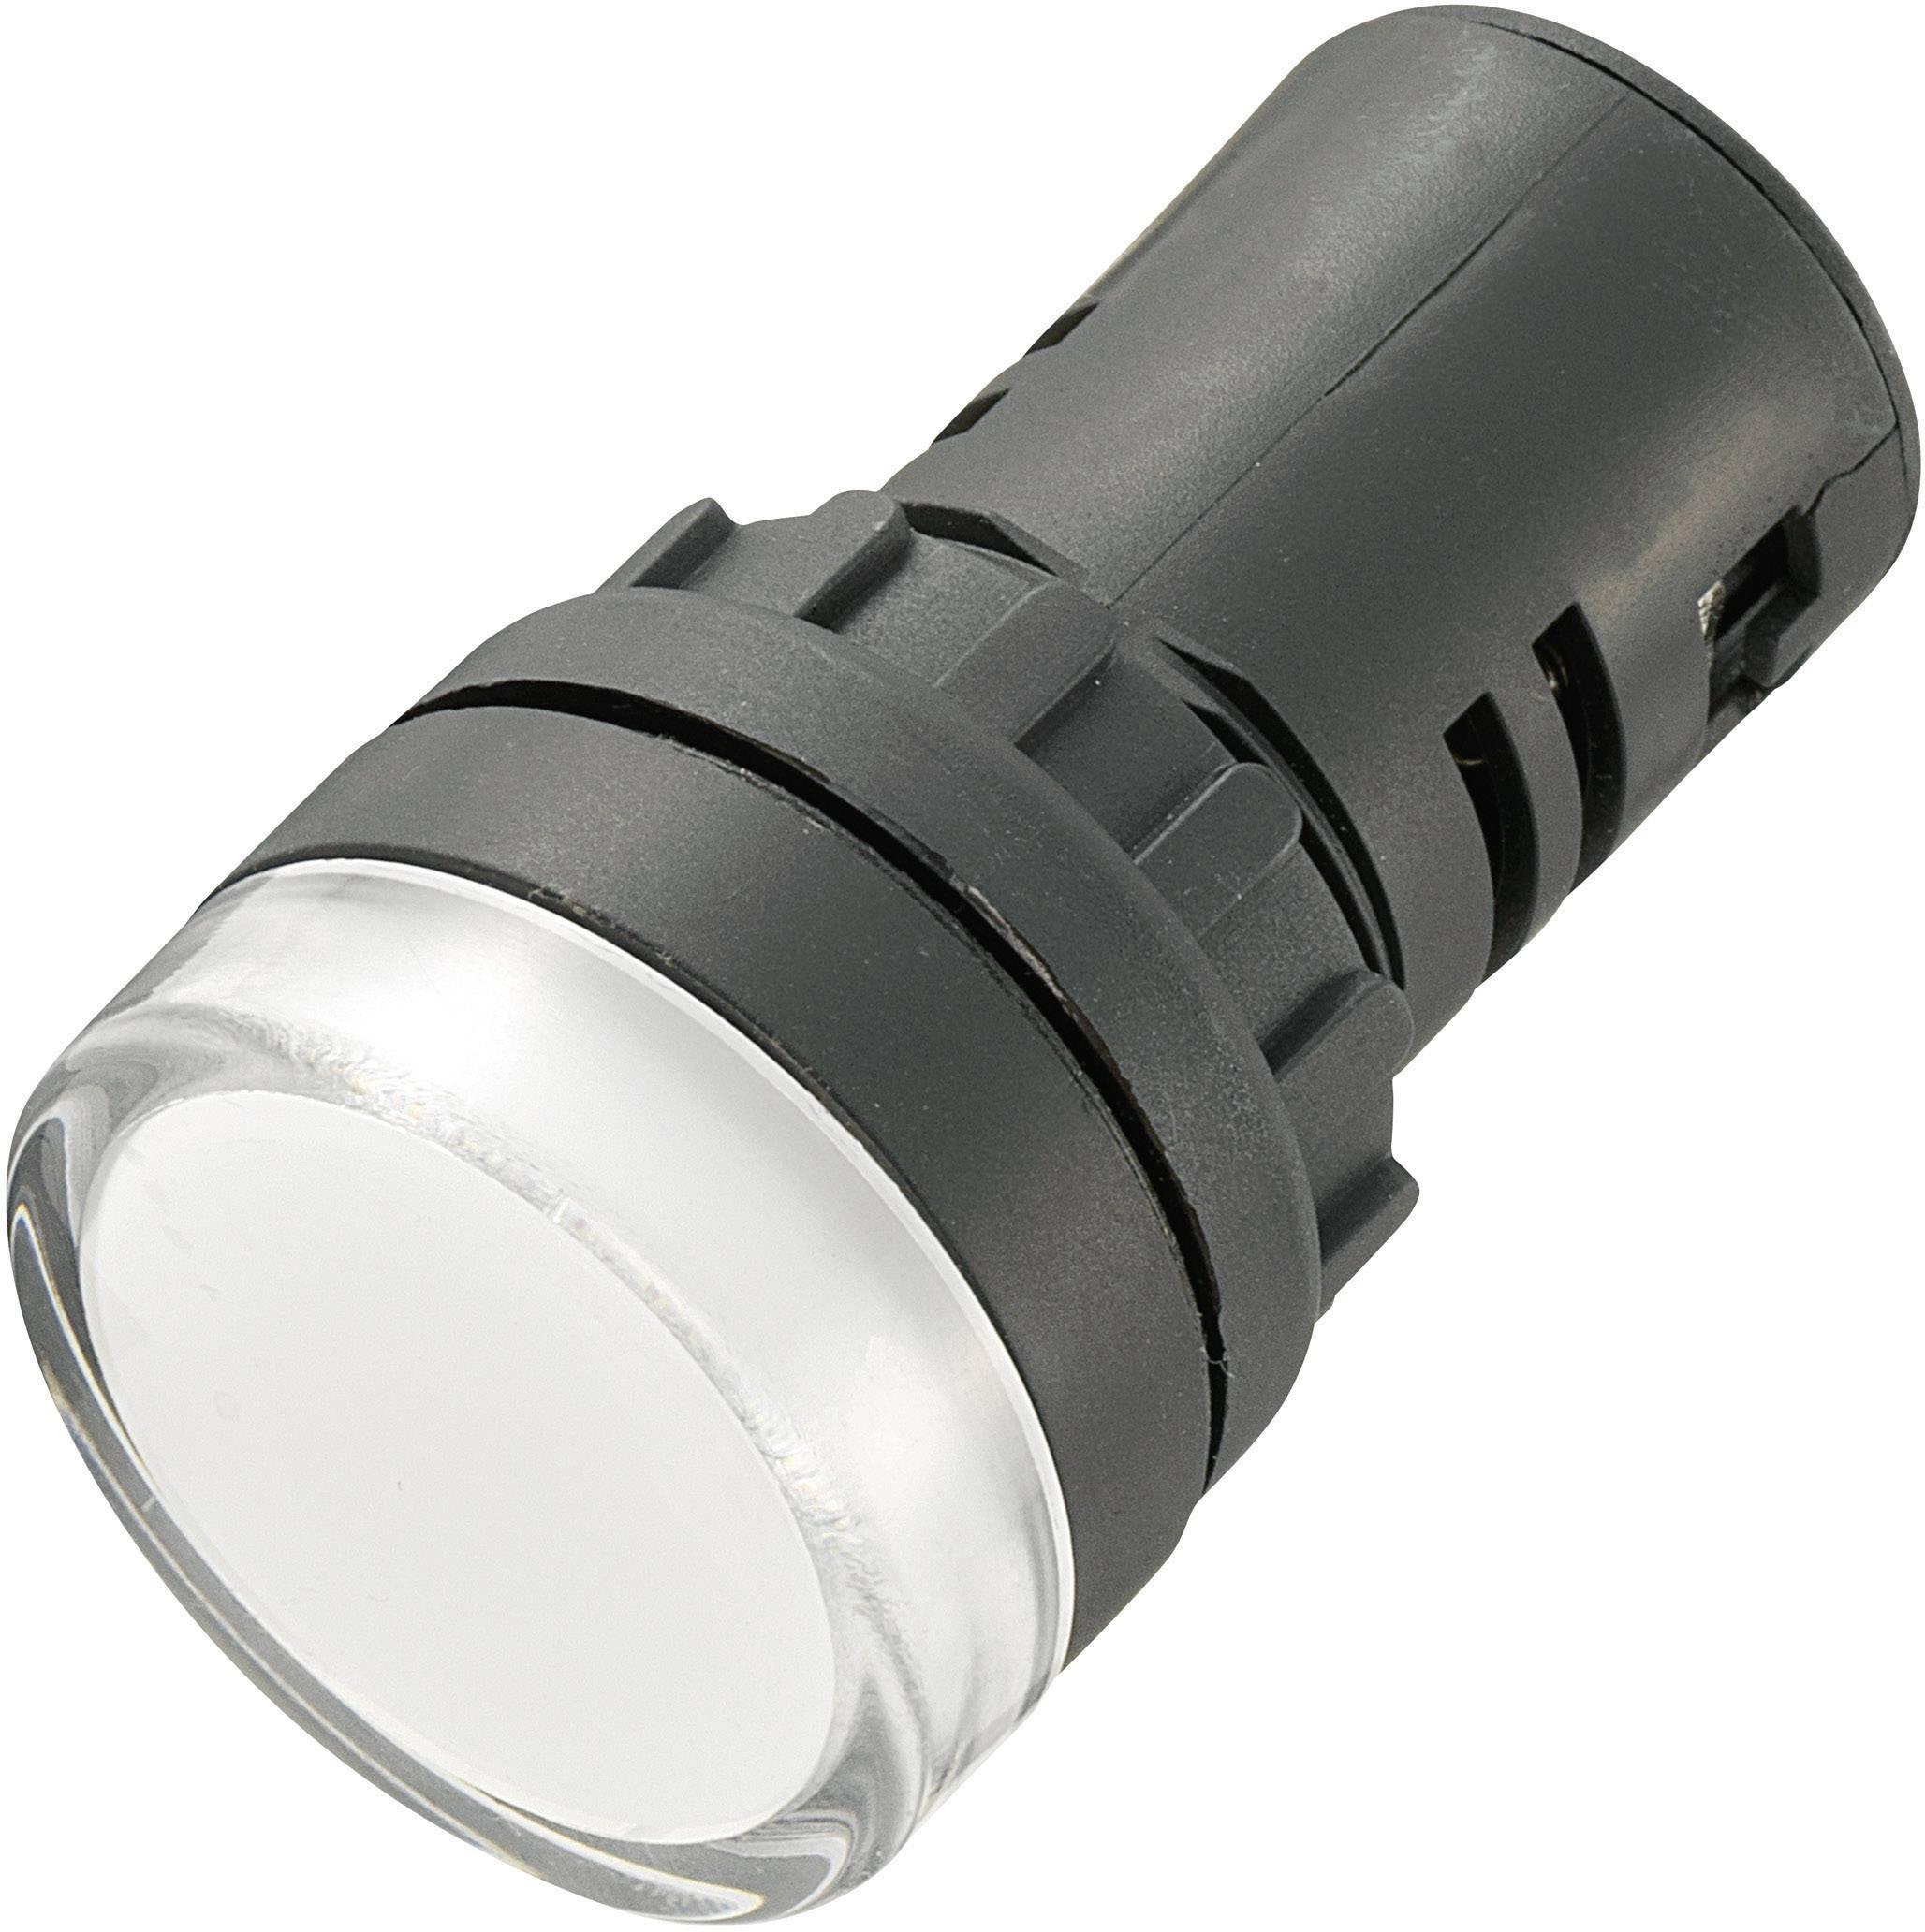 LED signalleuchte Kontrolllampe Weiß Grün Gelb Rot Blau AC DC 12V 5 Stück